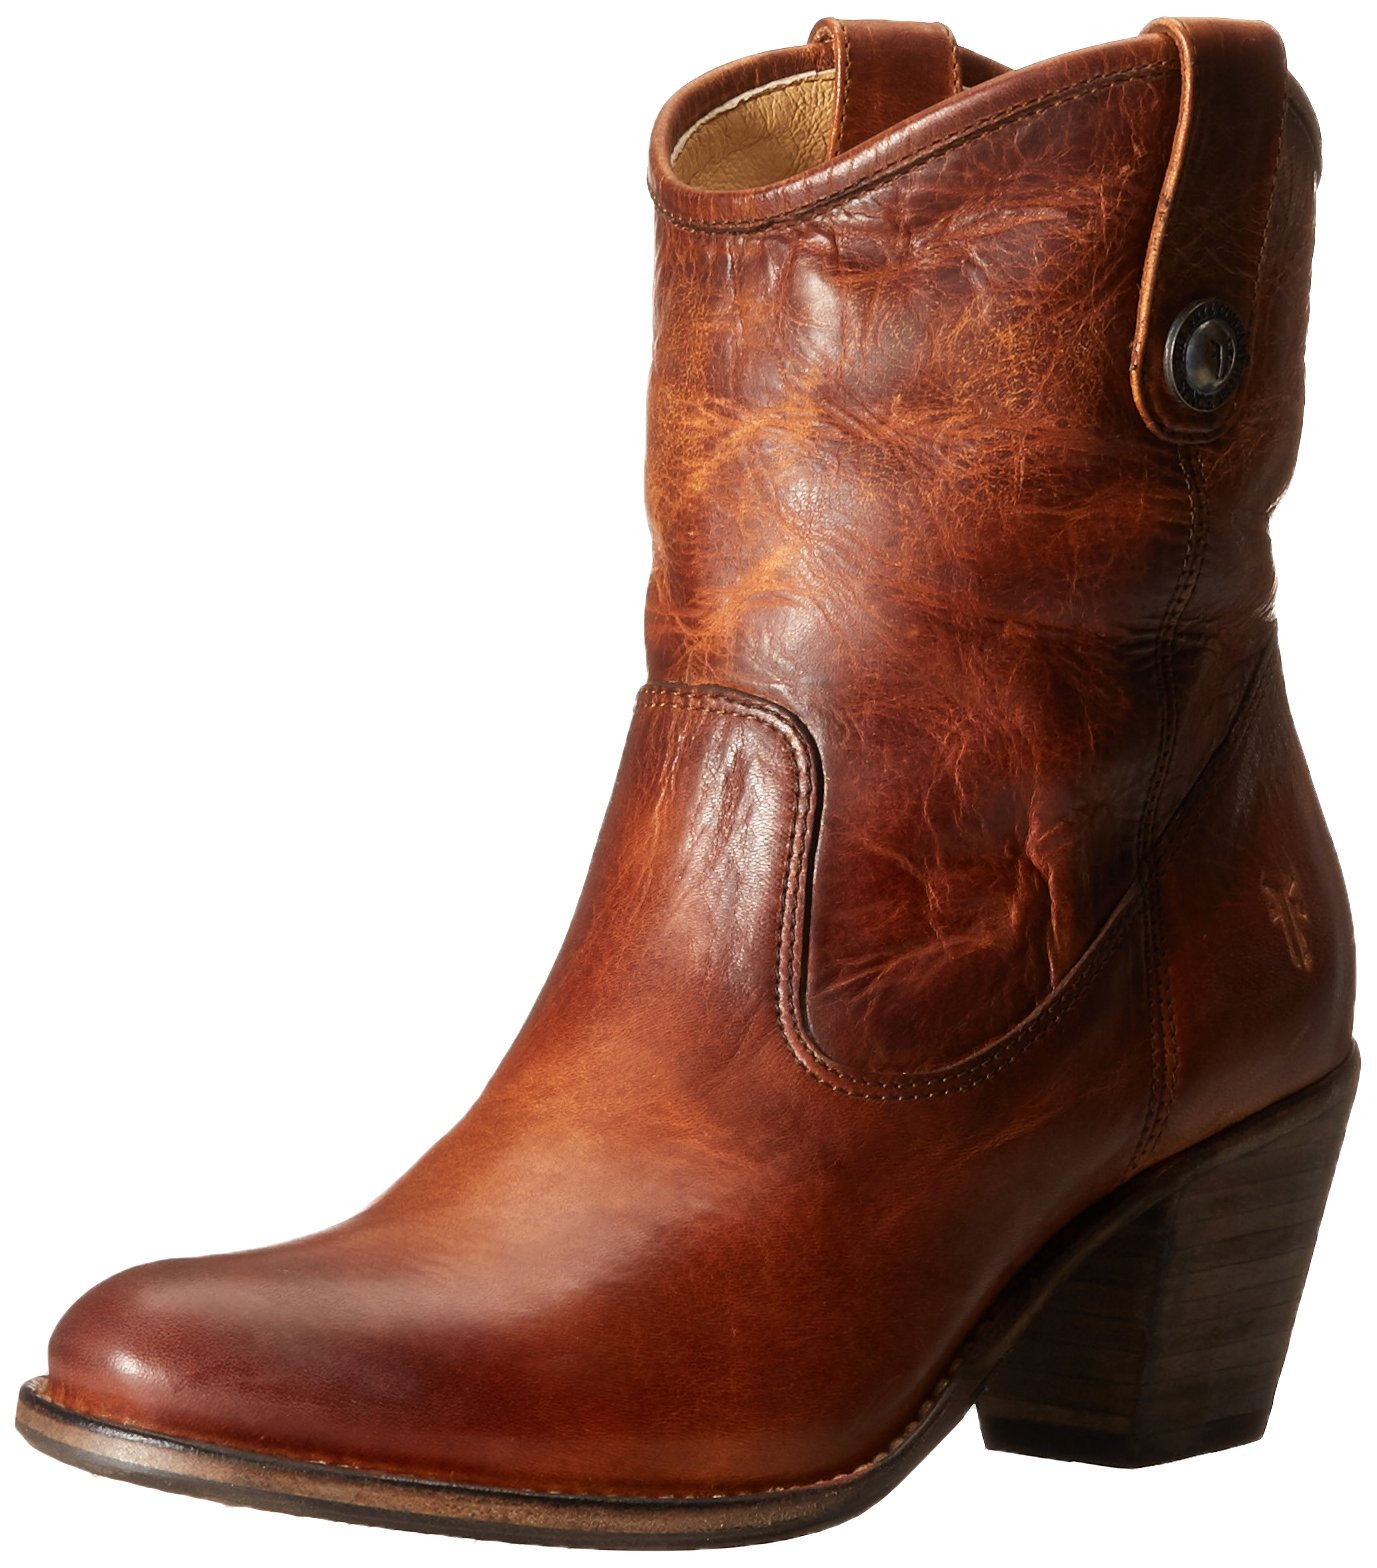 FRYE Women's Jackie Button Short Boot, Cognac, 6 M US